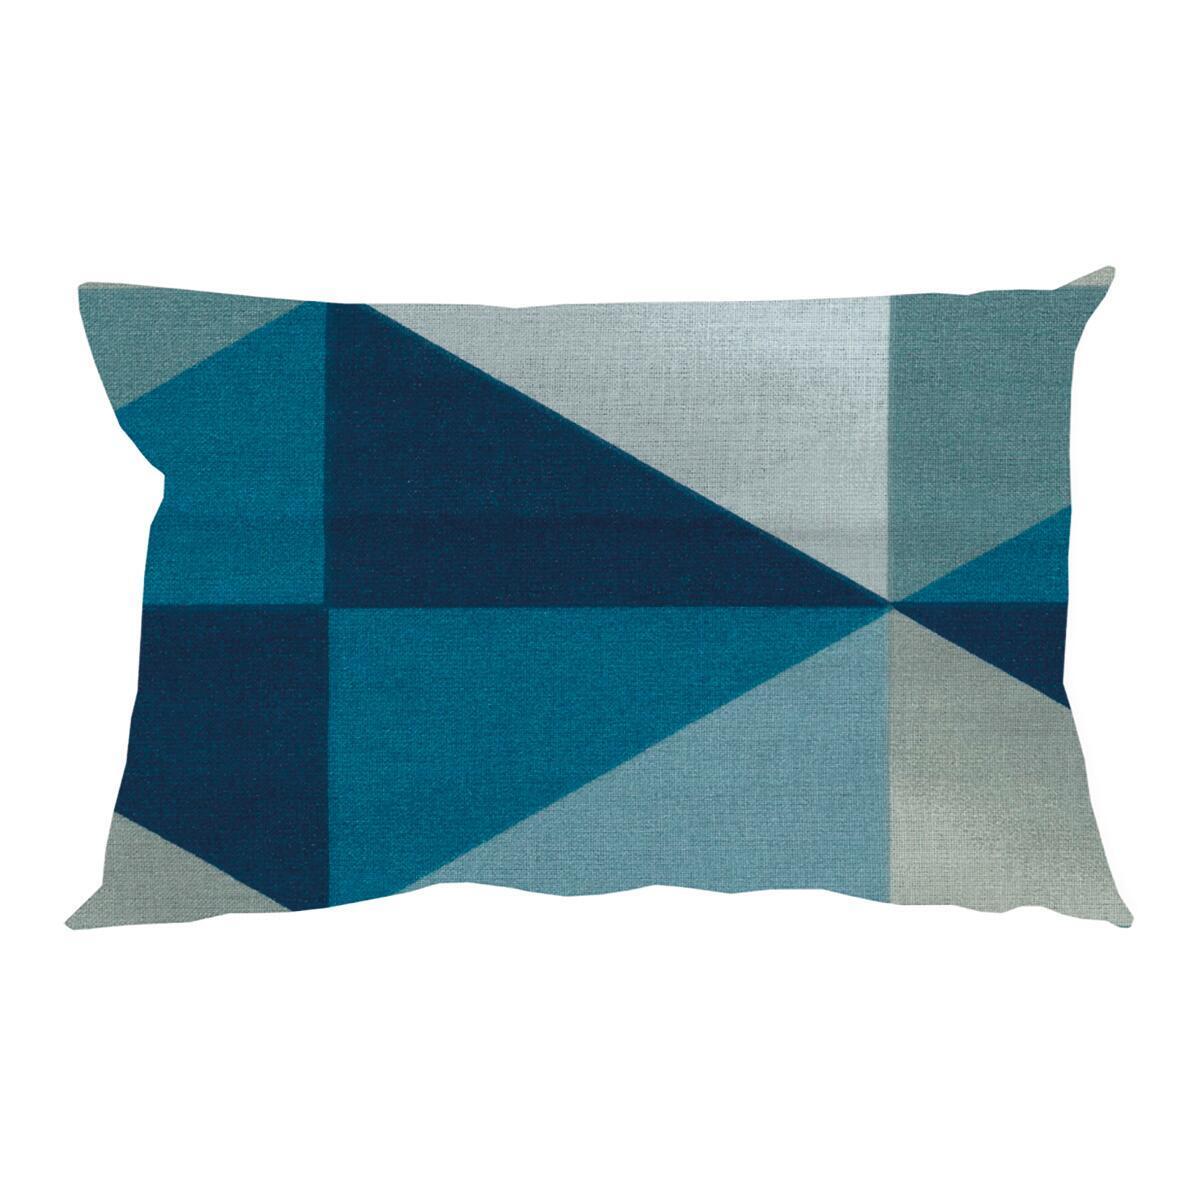 Fodera per cuscino GABRY azzurro 50x30 cm